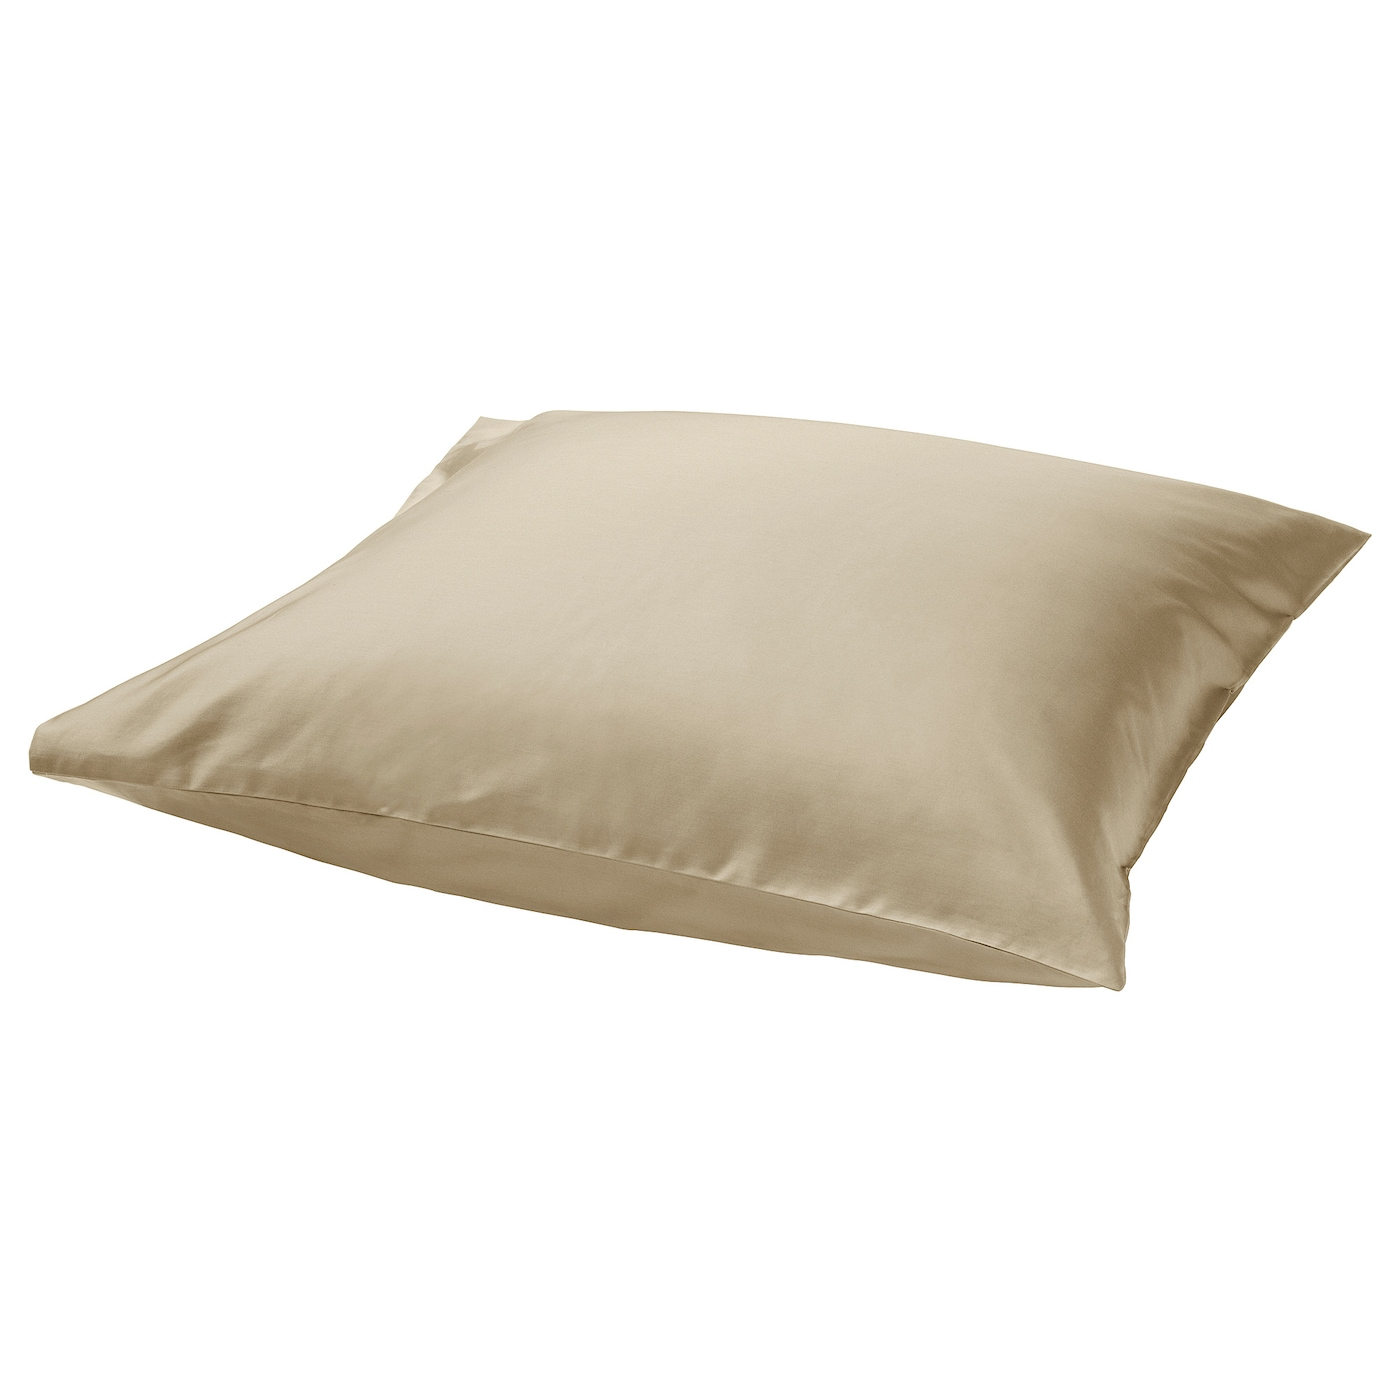 nattjasmin taie d 39 oreiller beige 65 x 65 cm ikea. Black Bedroom Furniture Sets. Home Design Ideas